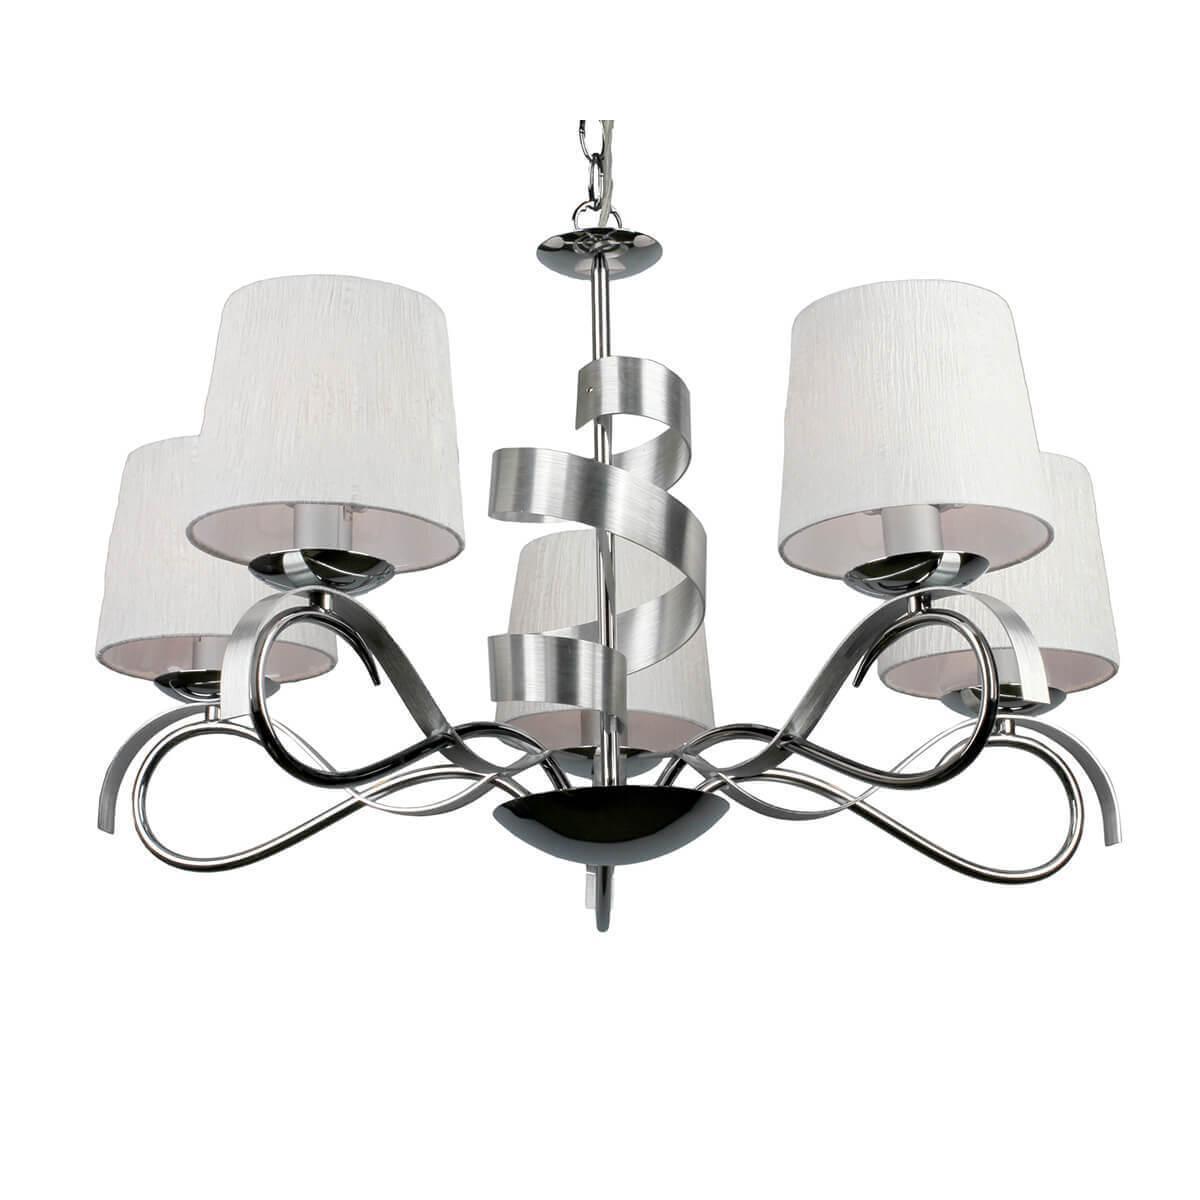 Подвесной светильник Omnilux OML-60103-05, E14, 40 Вт